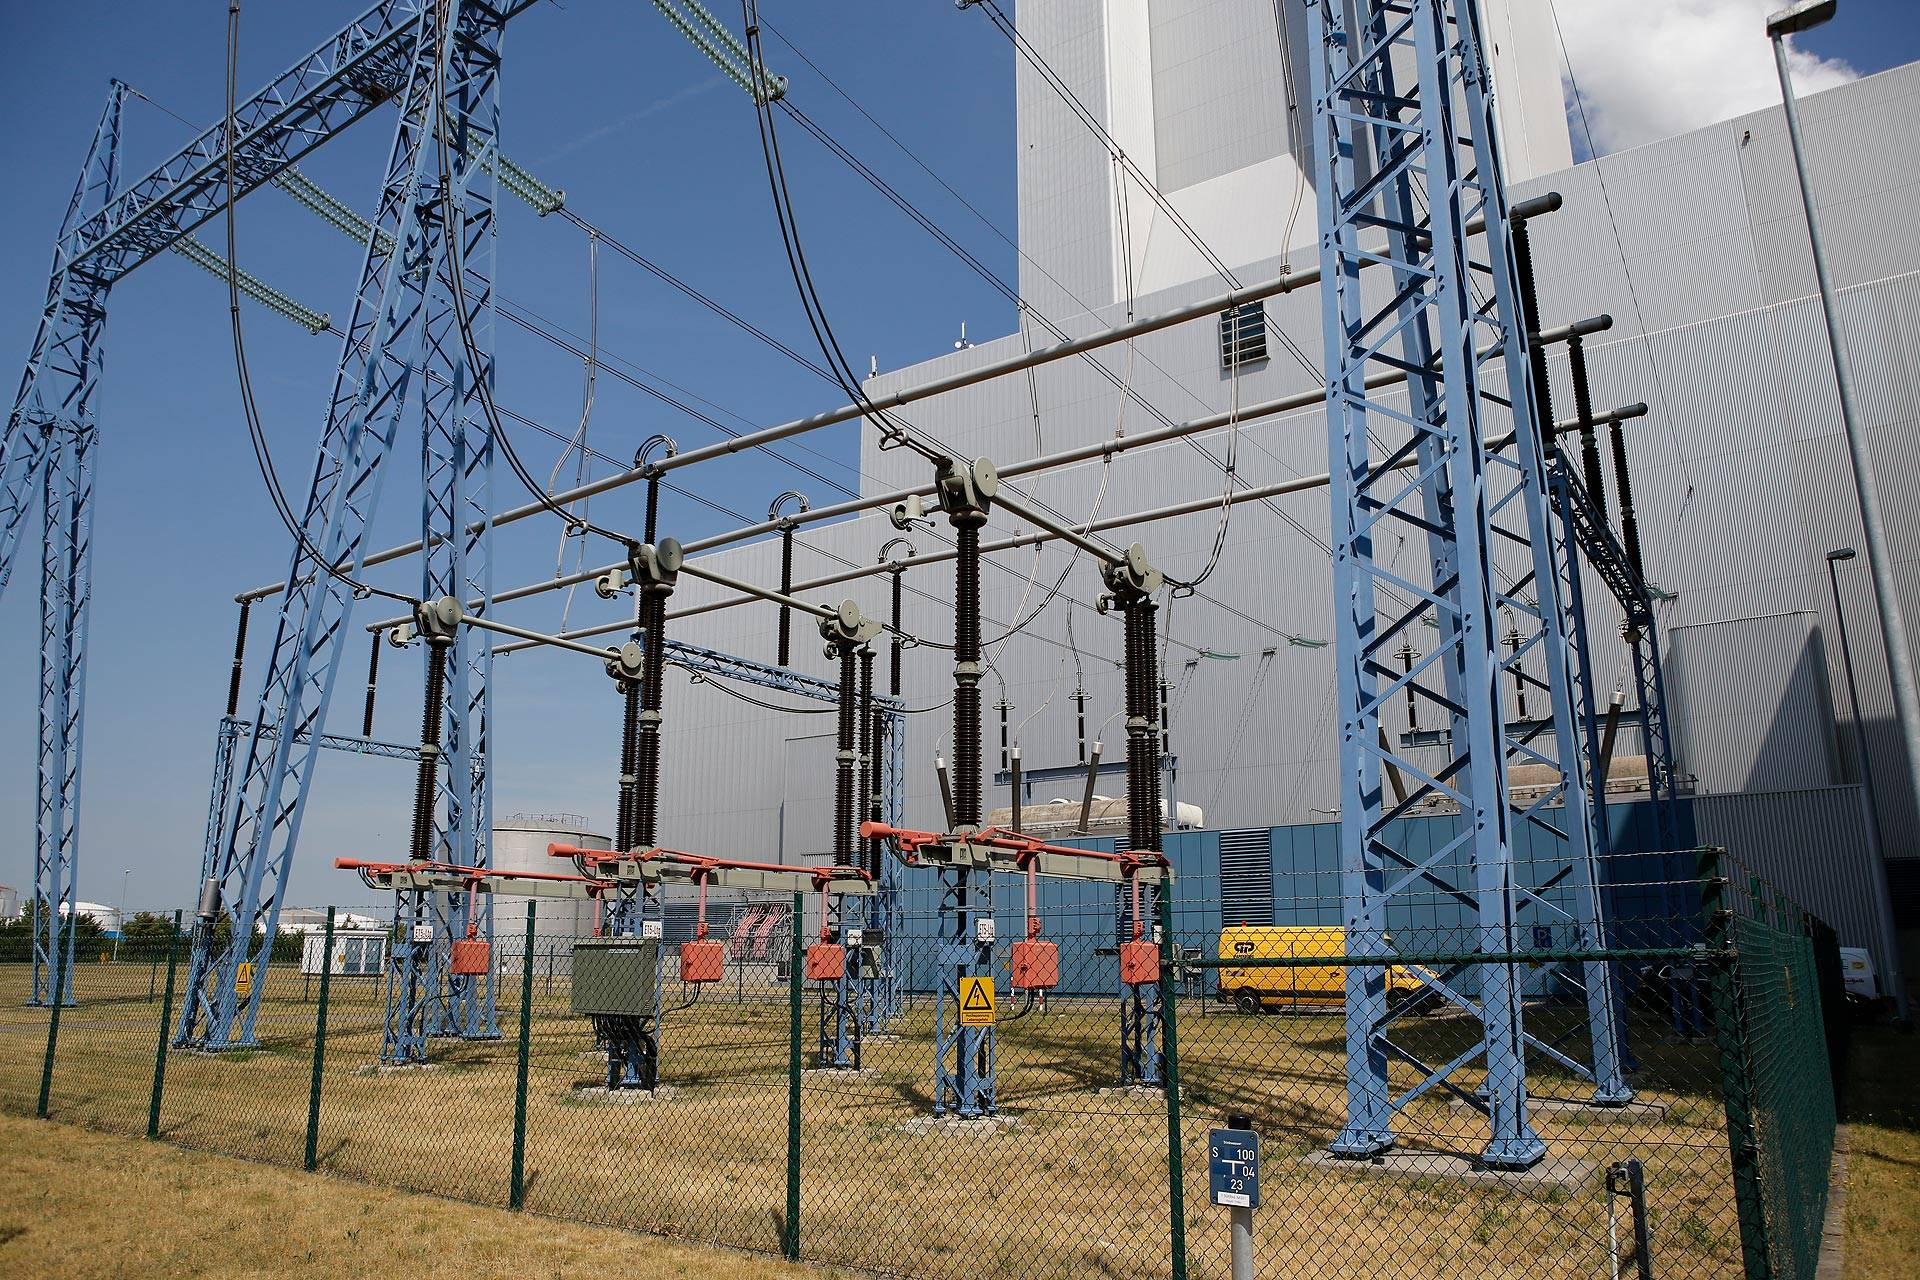 Kraftwerklippendorf2018dk e6a4752